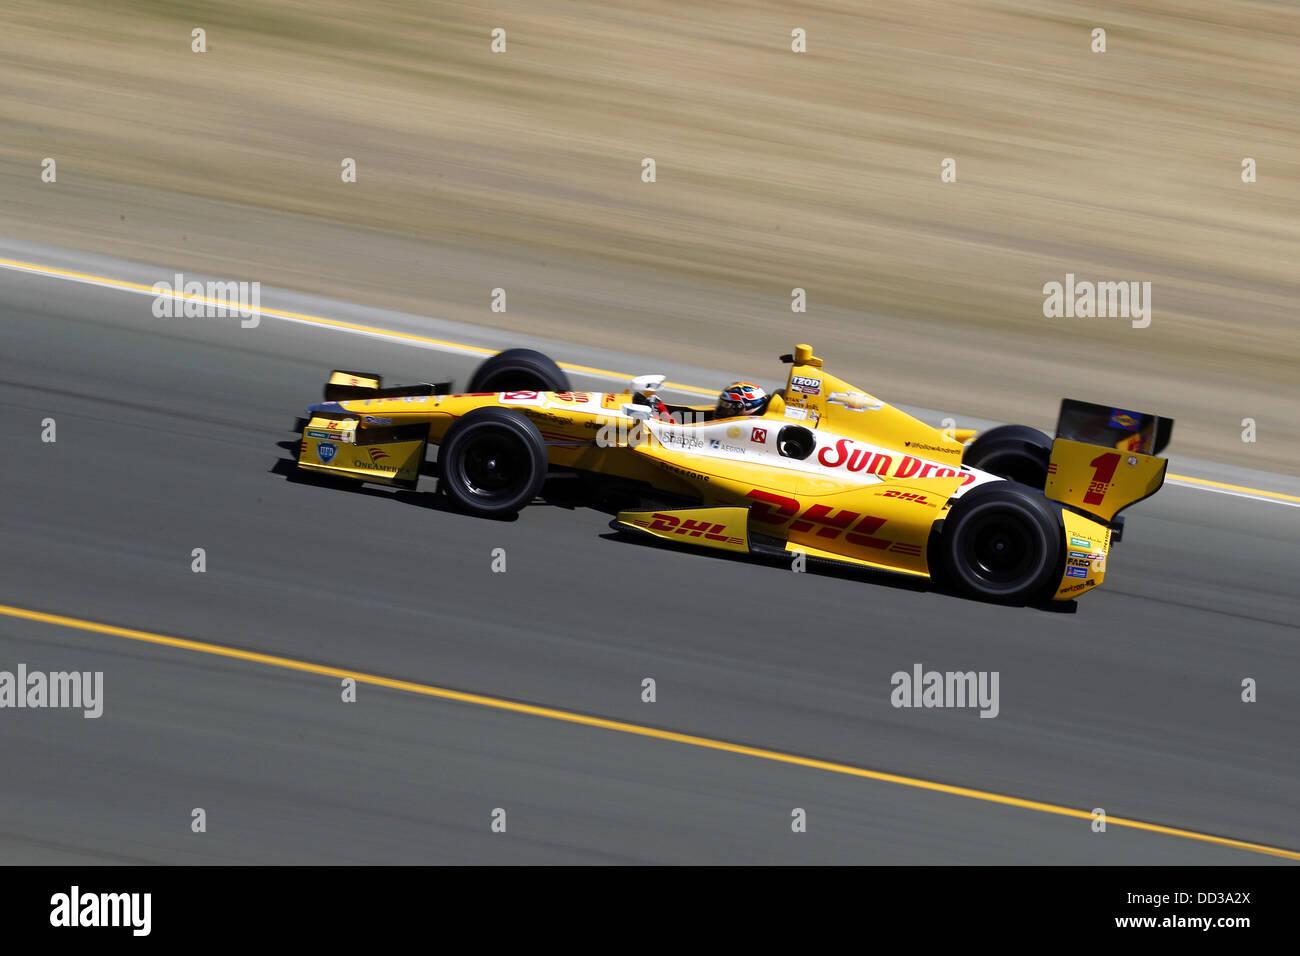 540cb37c49b Sonoma, California, US. 24th Aug, 2013. IZOD Indycar Series, Go